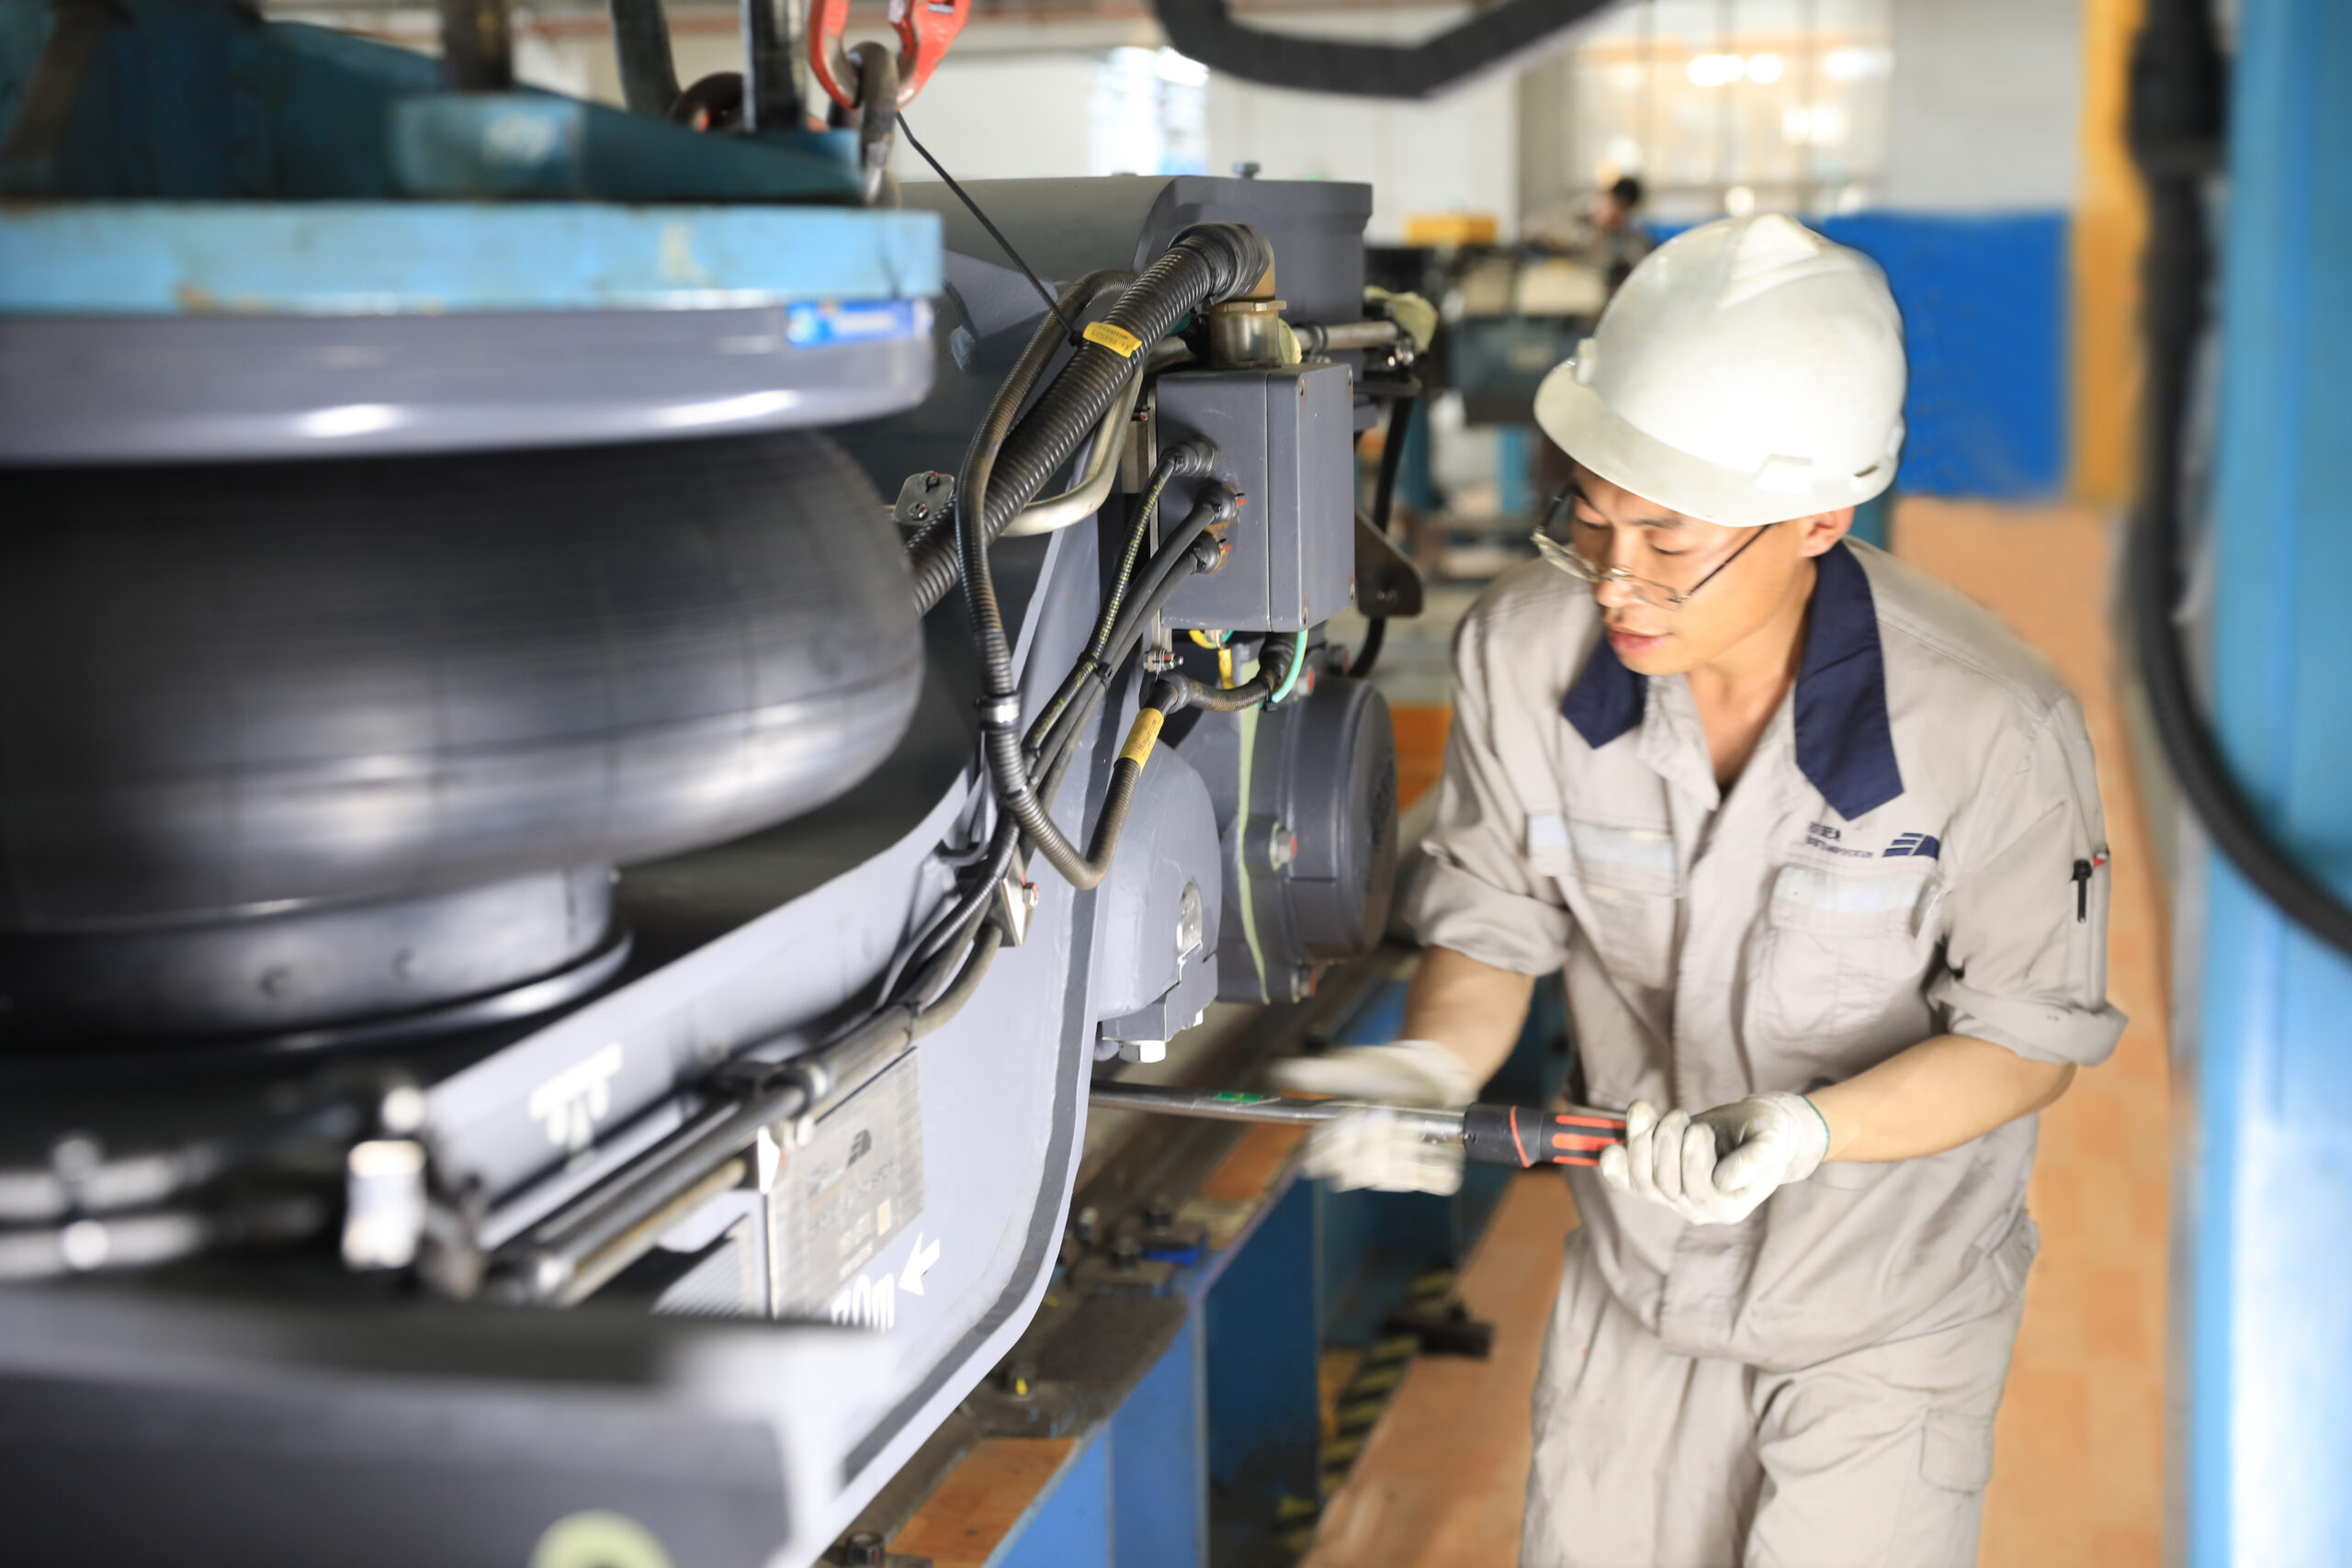 BST maintenance workshop, China